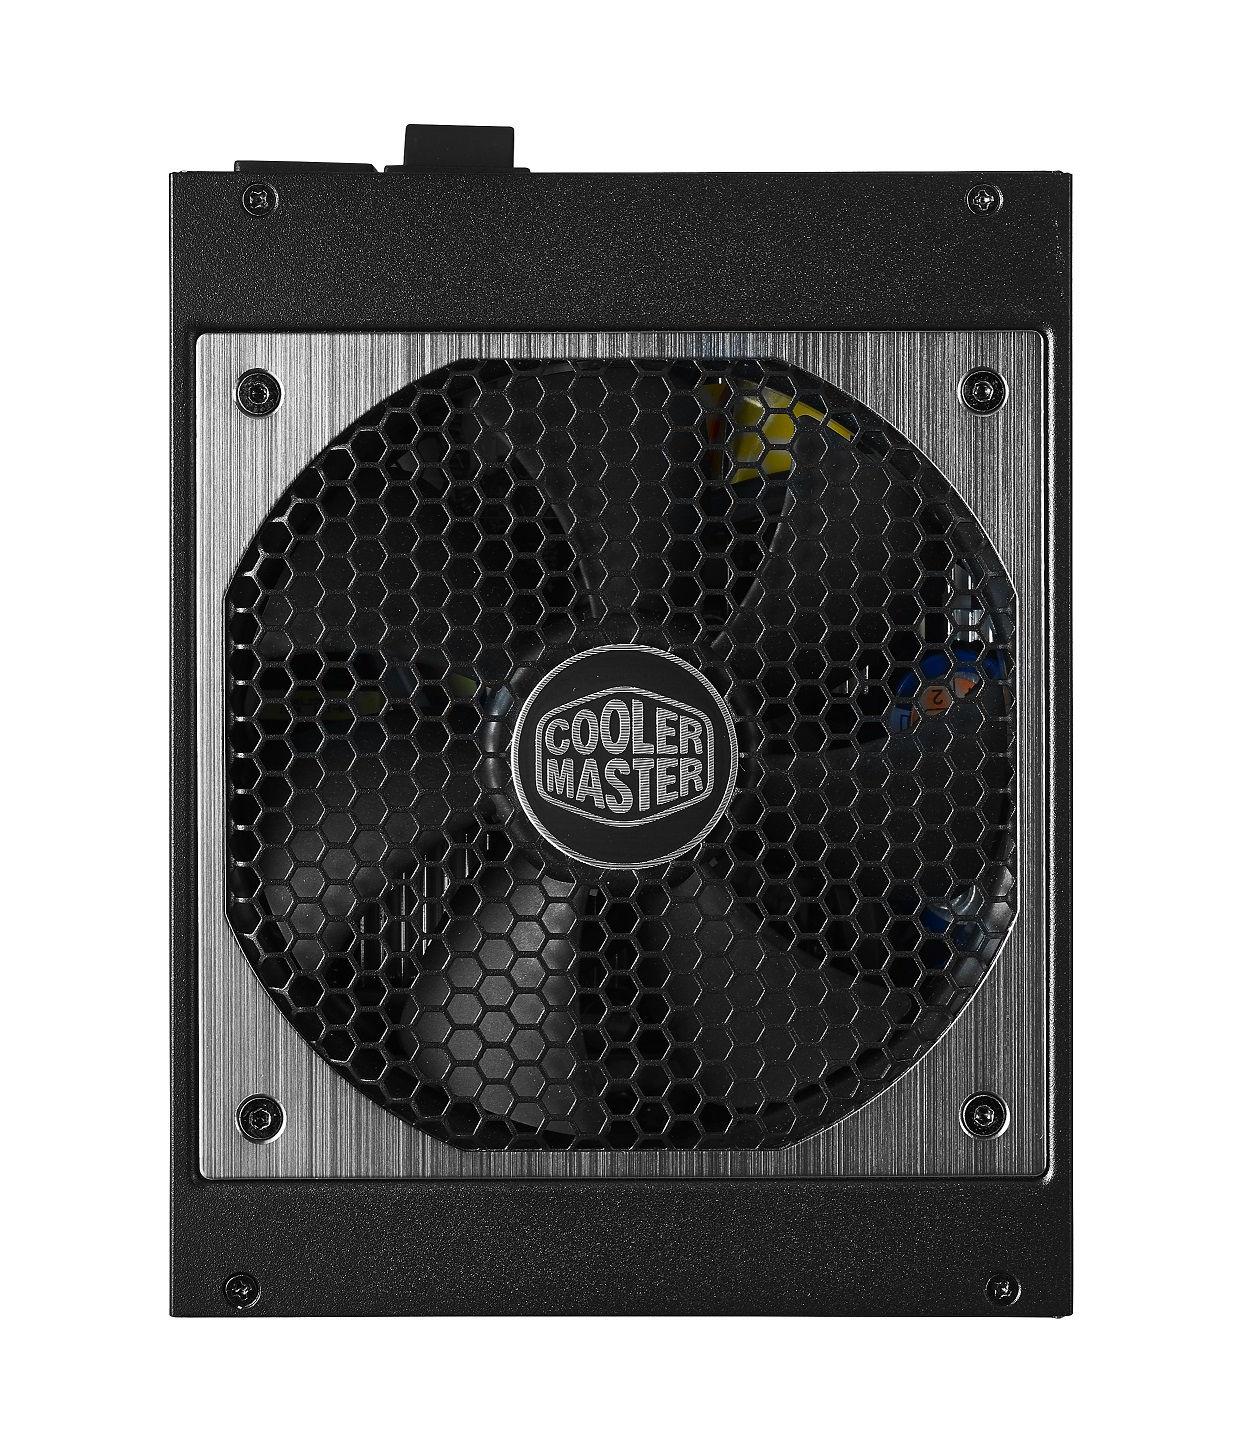 Cooler master v series v1200 platinum